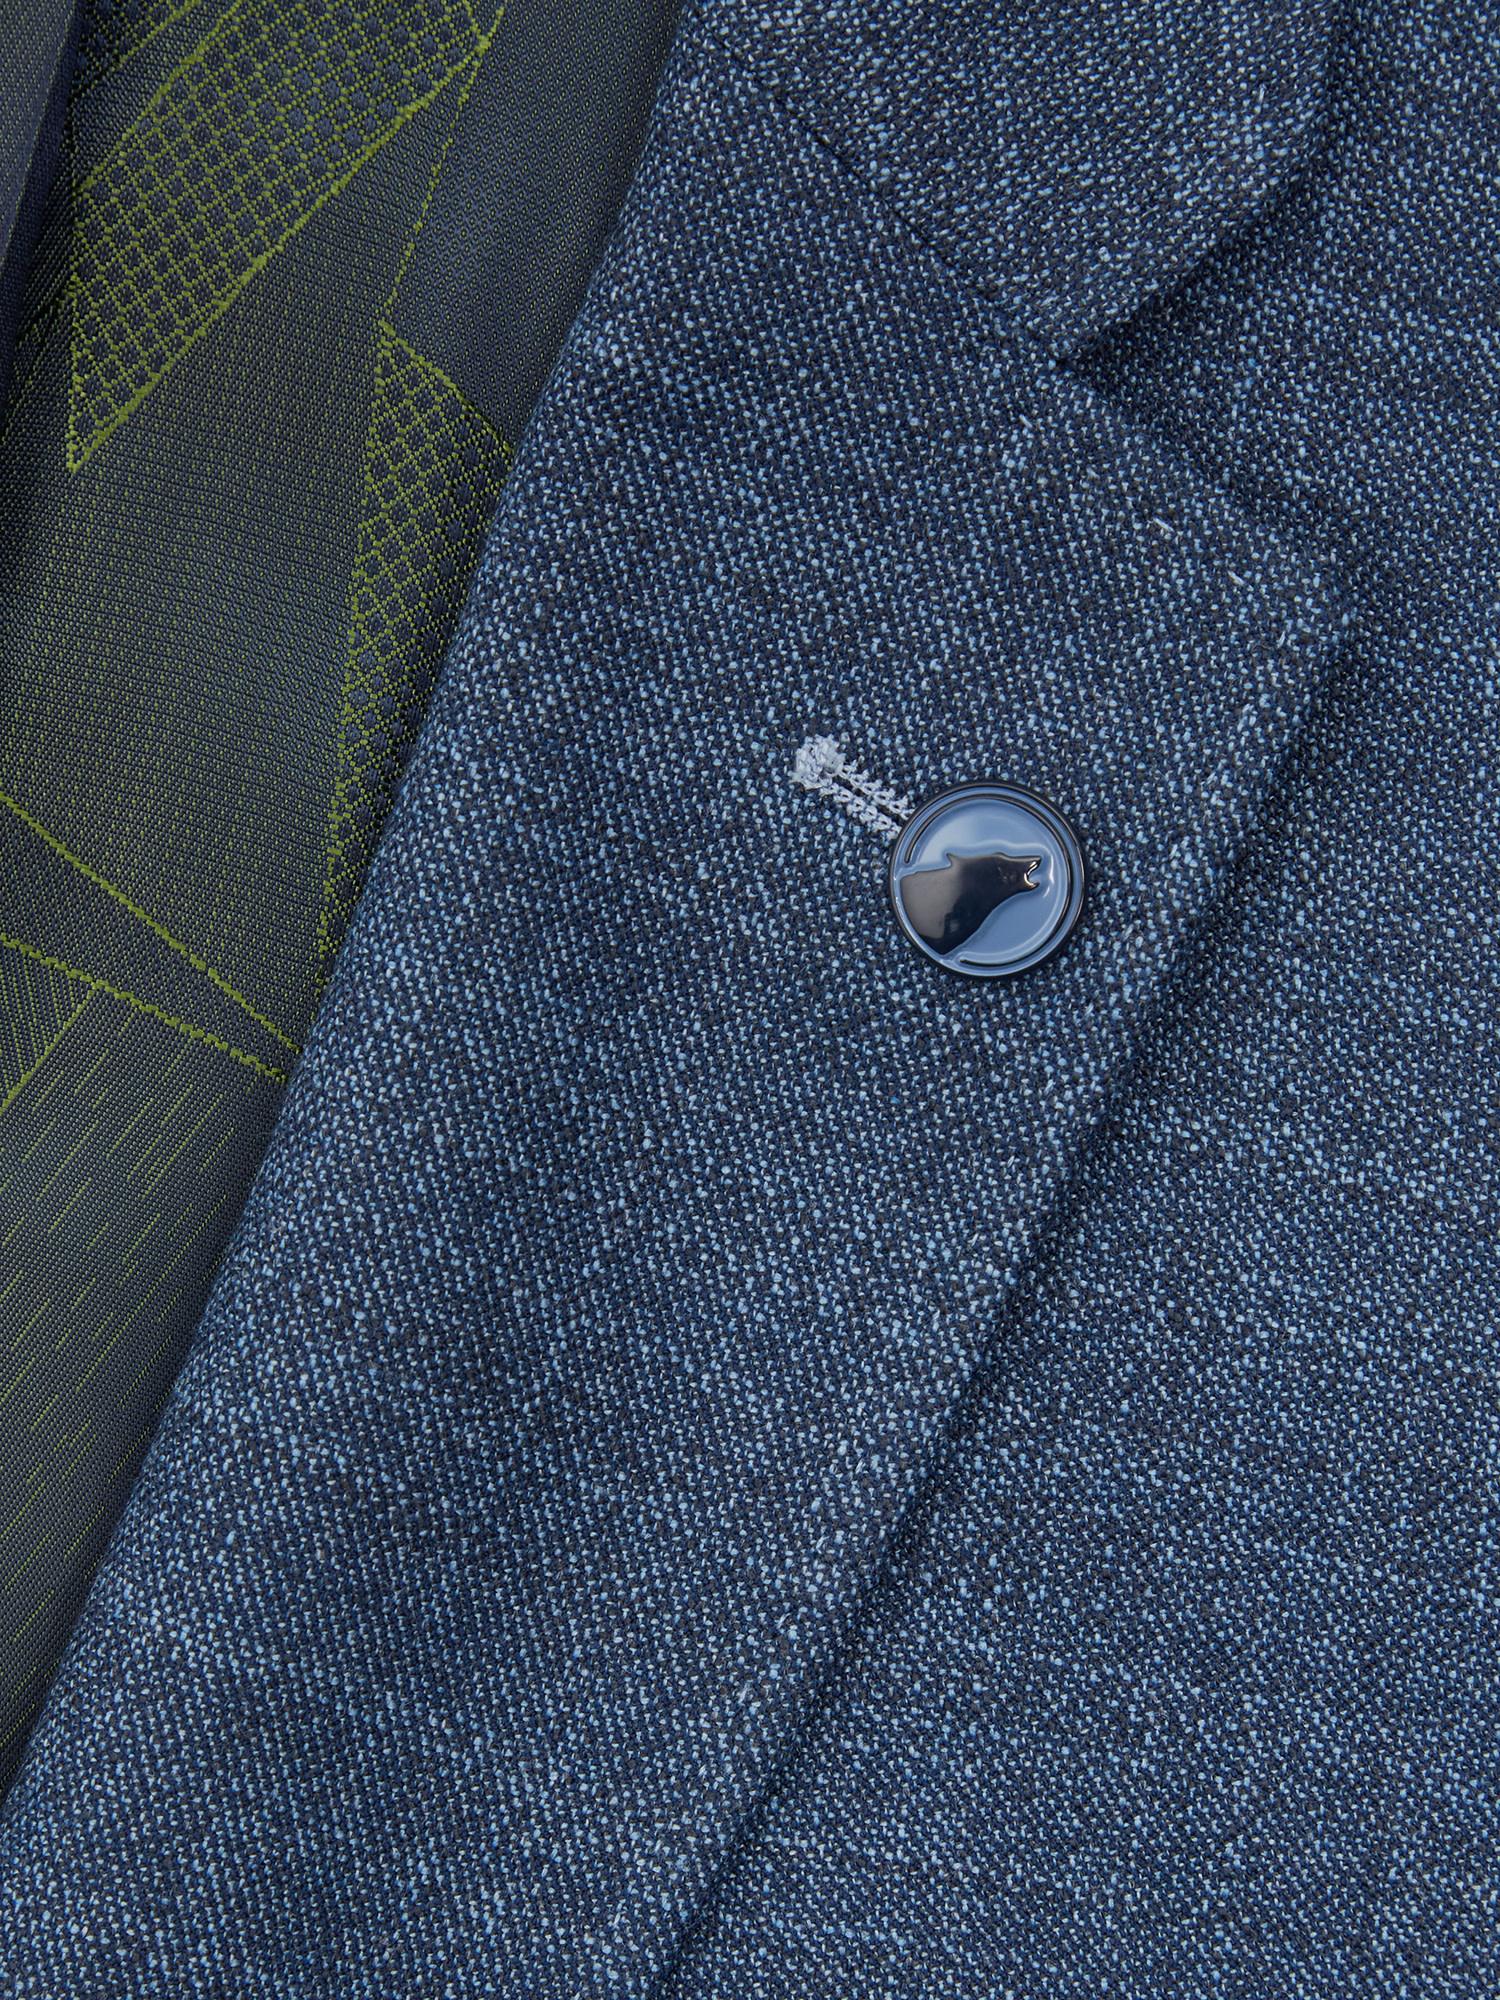 Remus Uomo 2 piece with optional check waistcoat